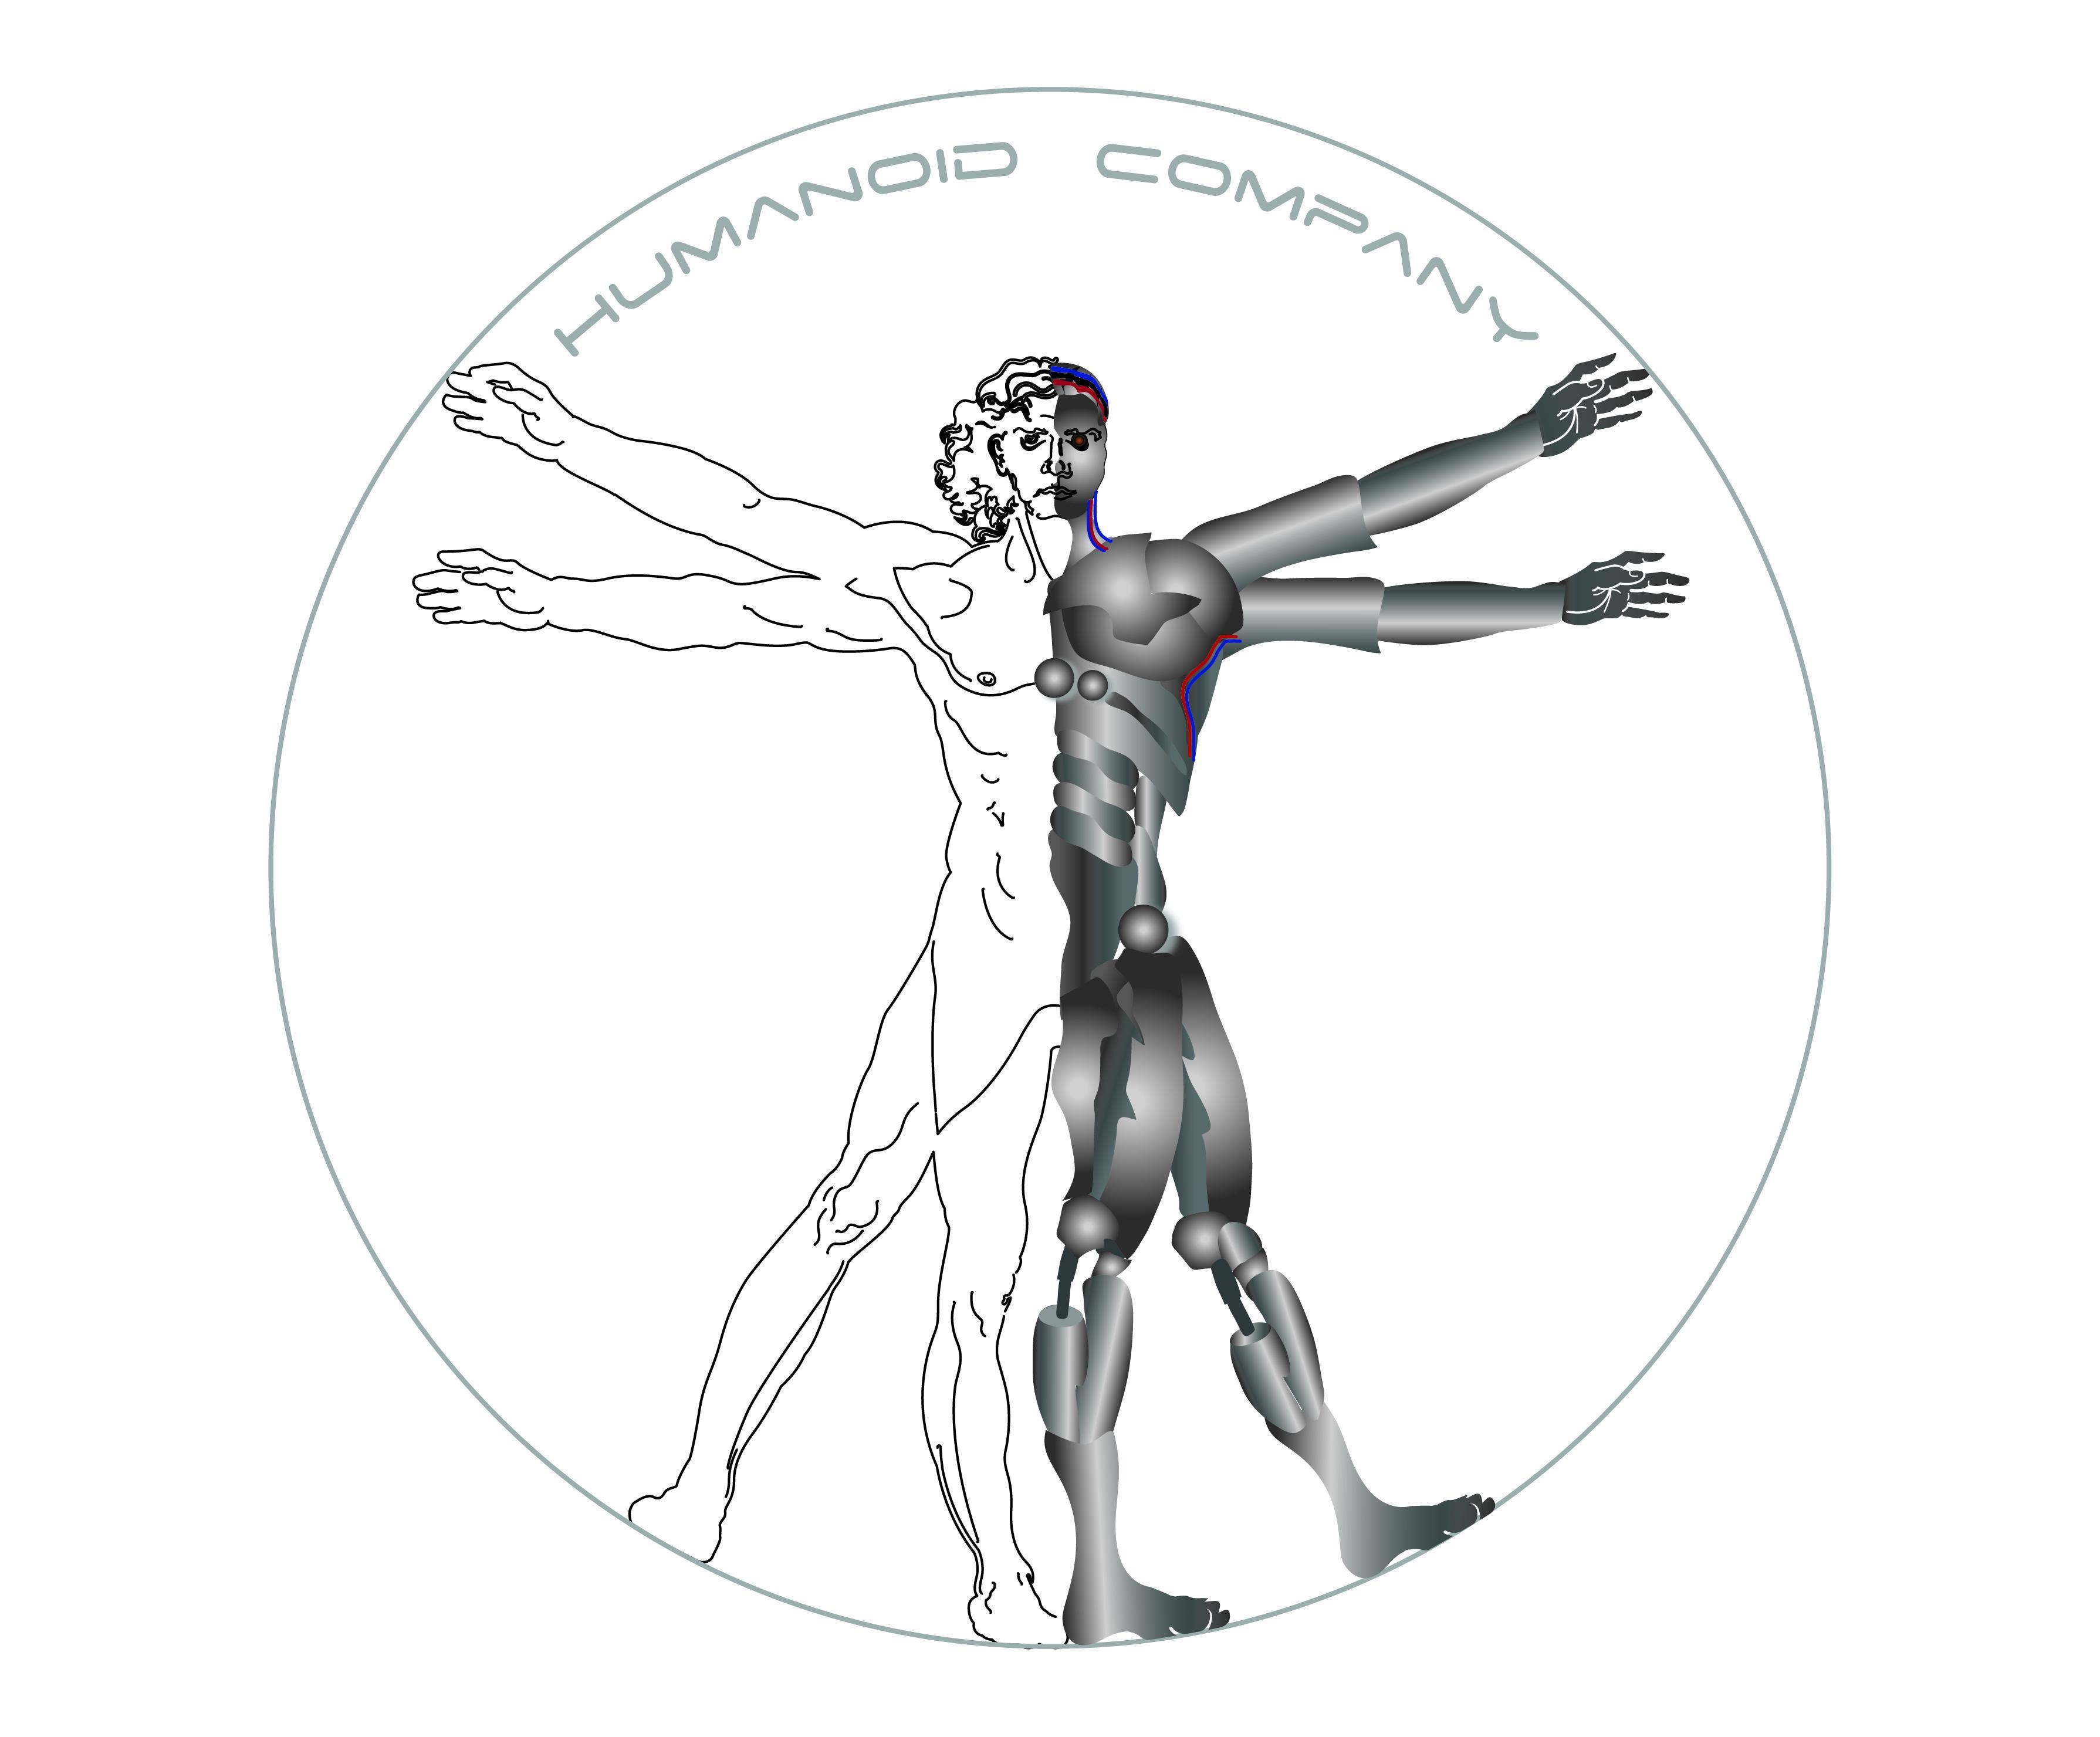 Humanoid Company sas di Cappellaro Simone